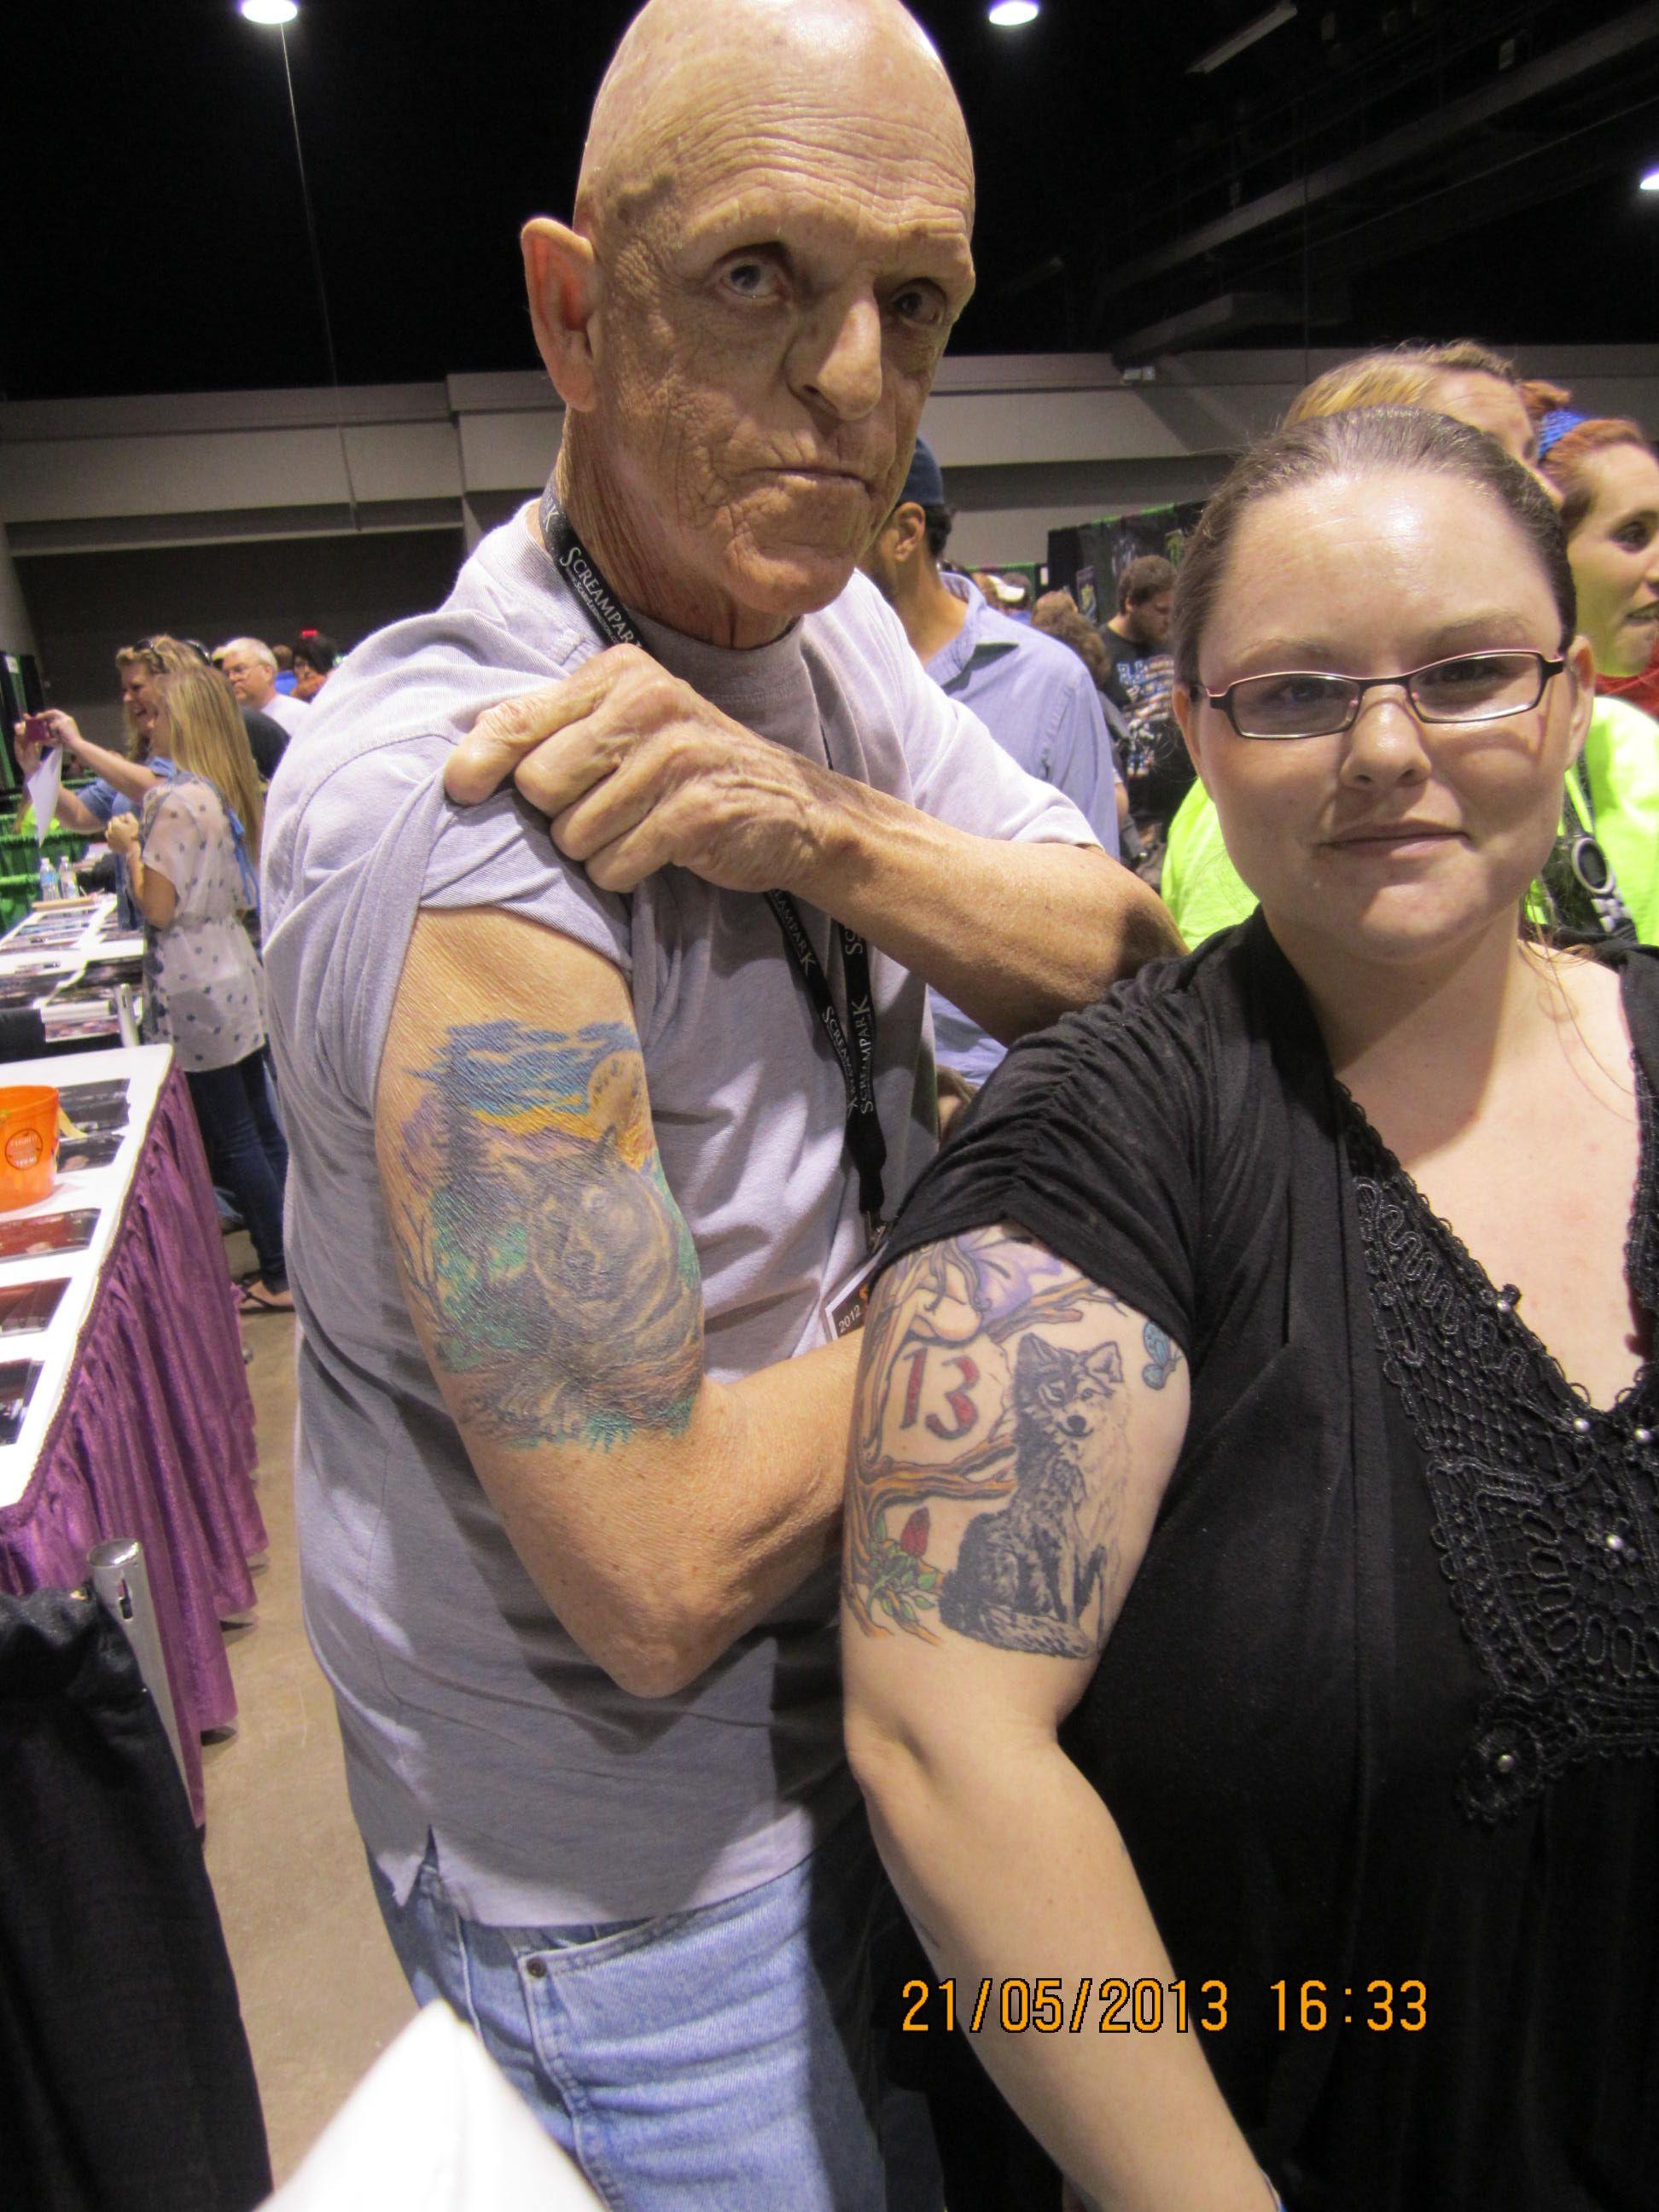 13 Pinner S Choice The Scarefest Michael Berryman Wolf Tattoos